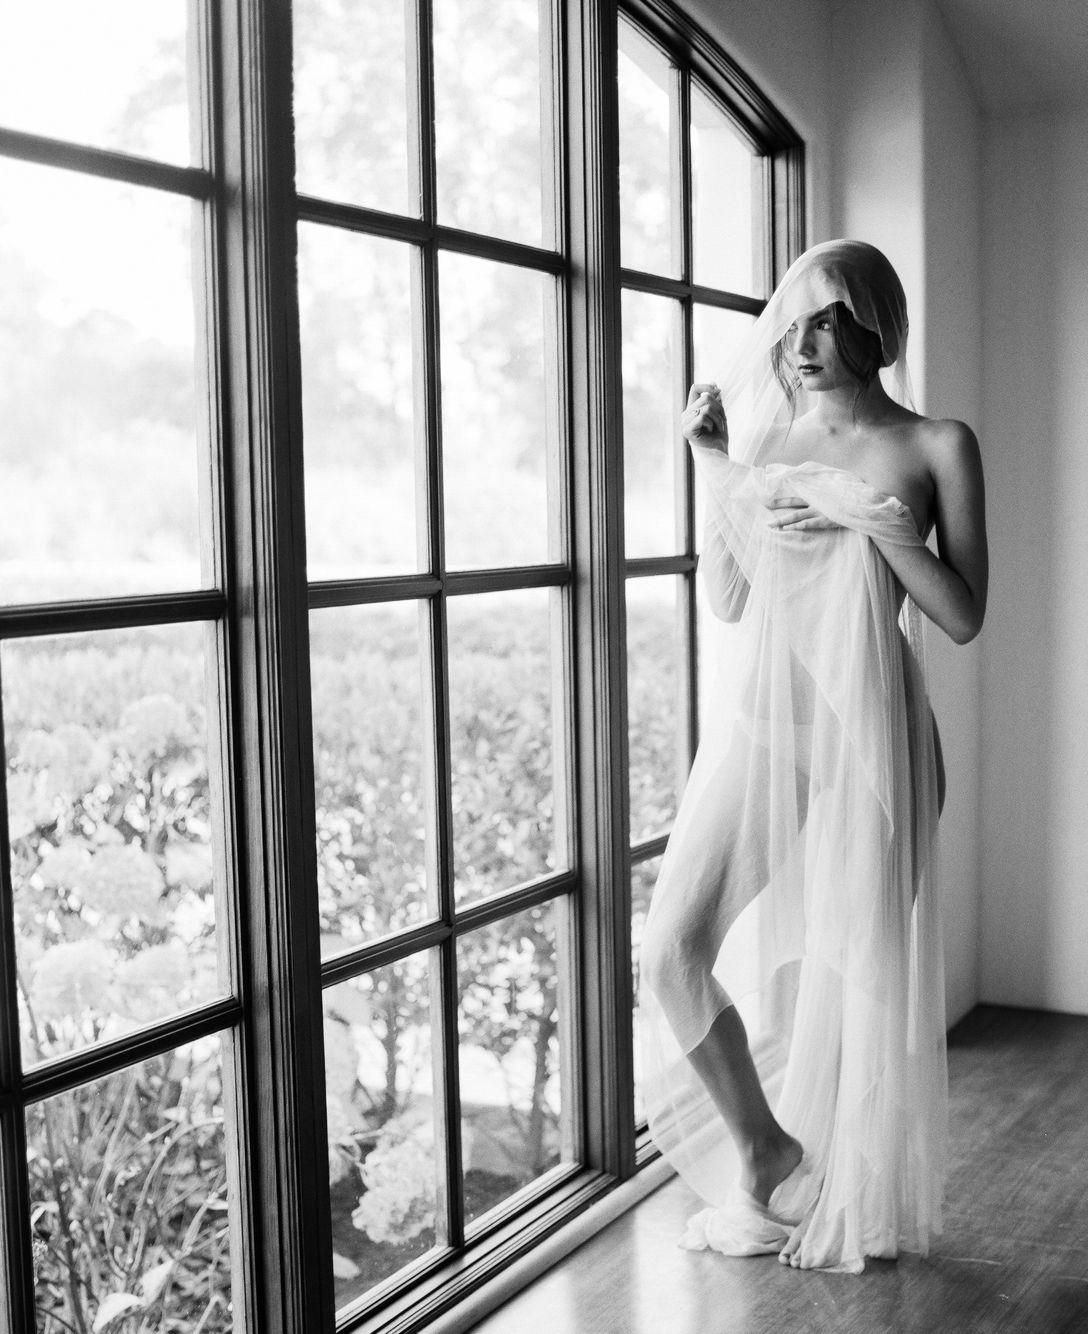 Michael Radford photography for Geraldine Magazine.